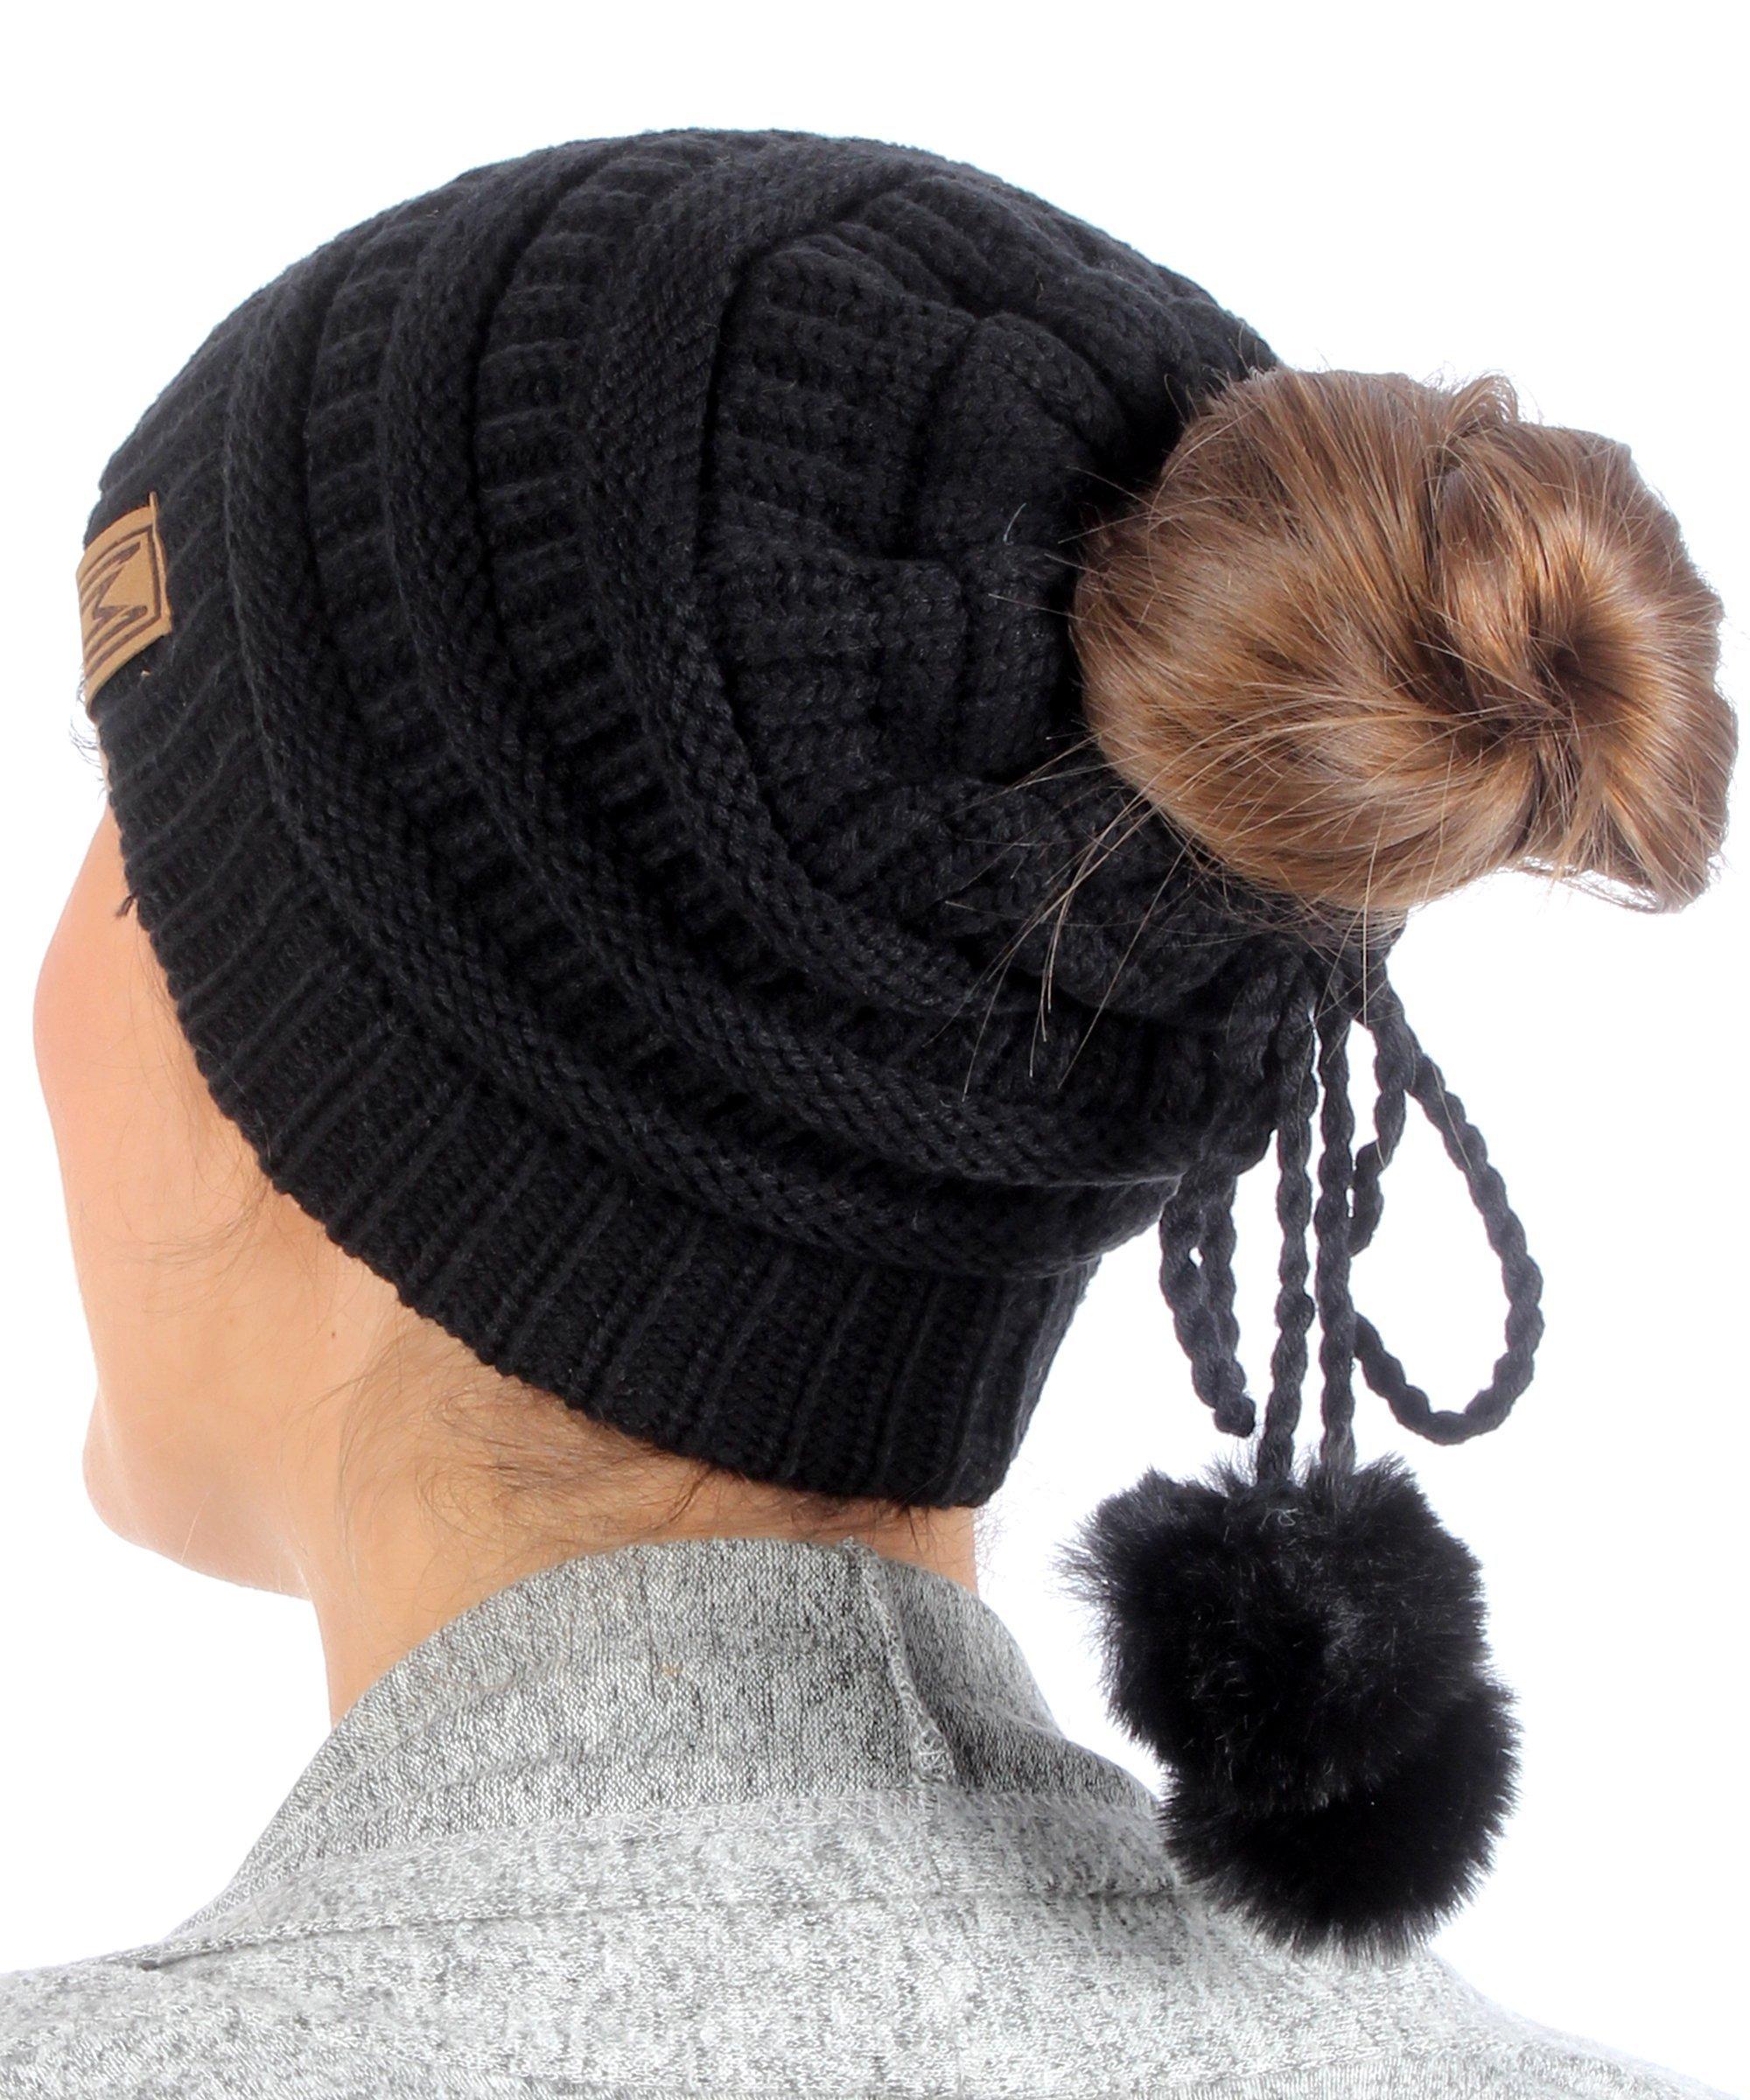 7f43b3967 MIRMARU Women's Ponytail Messy Bun Beanie Ribbed Knit Hat Cap with  Adjustable Pom Pom String - Cool Beanie Hats